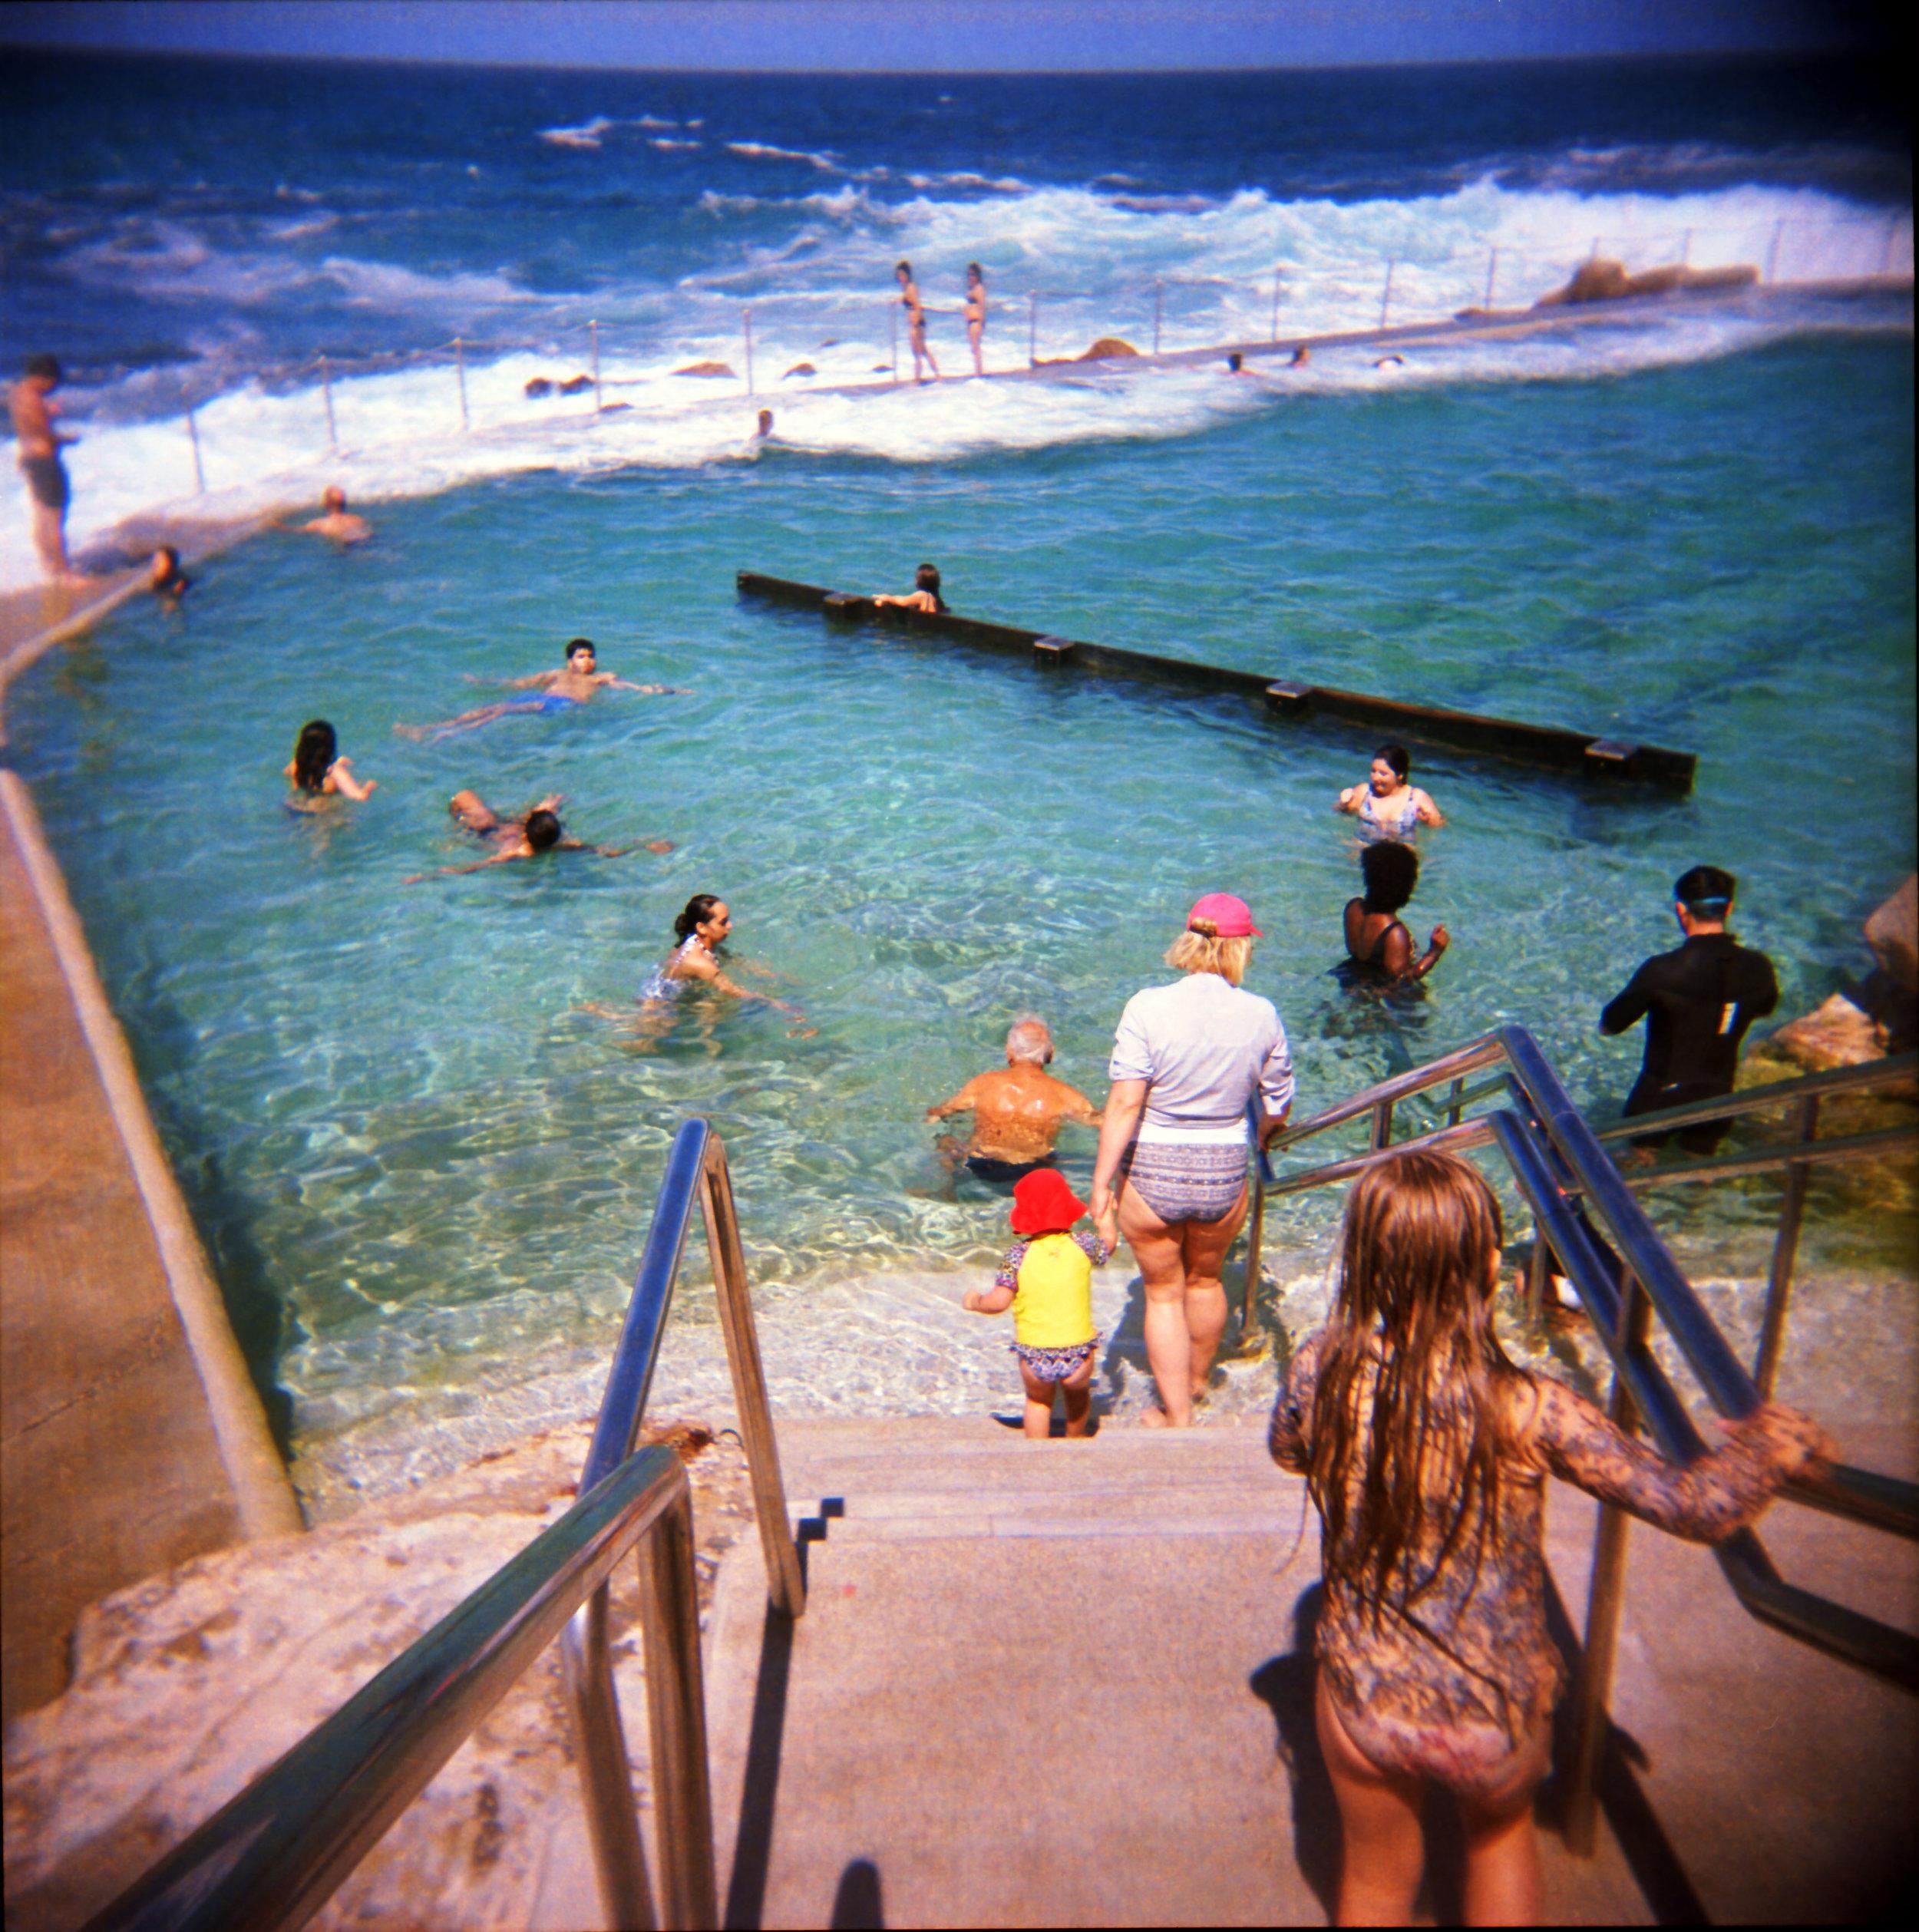 Sydney_coastal pool_edit copy_small.jpg